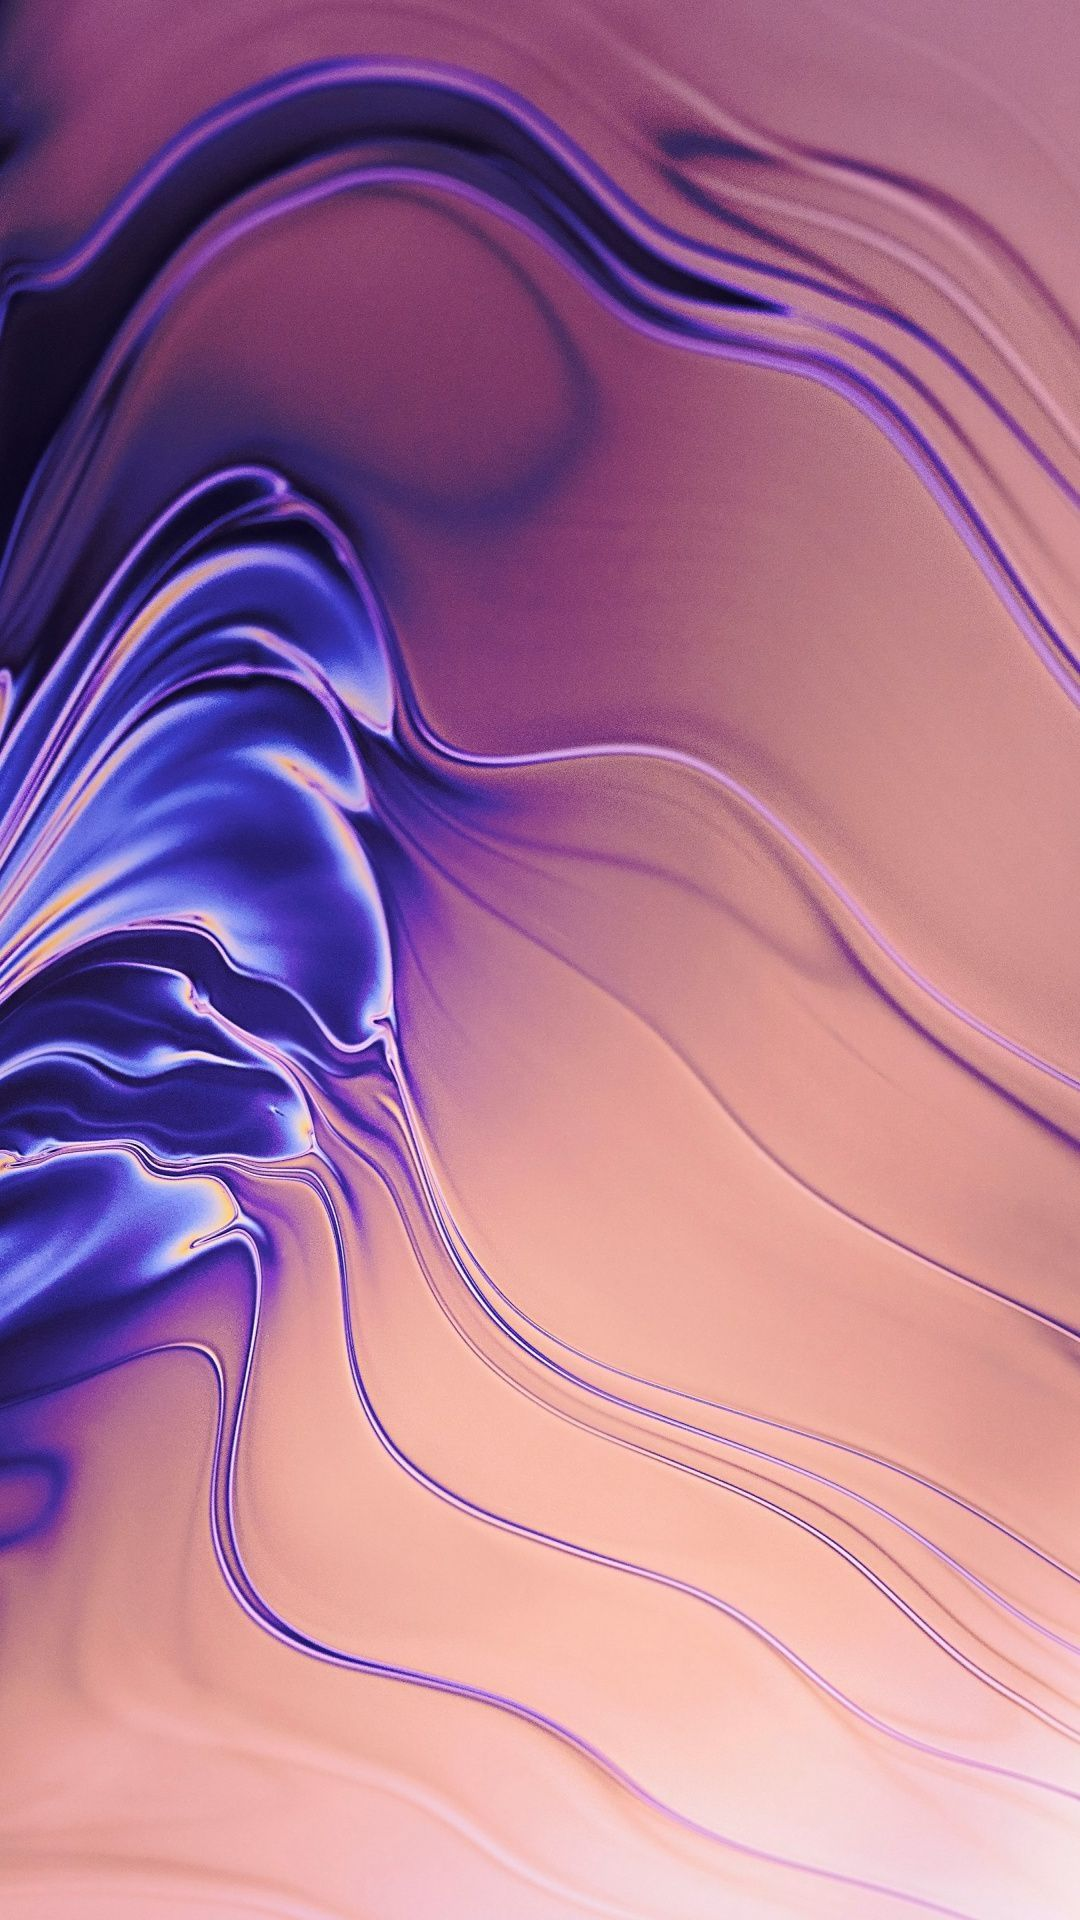 Abstract phone wallpaper hd